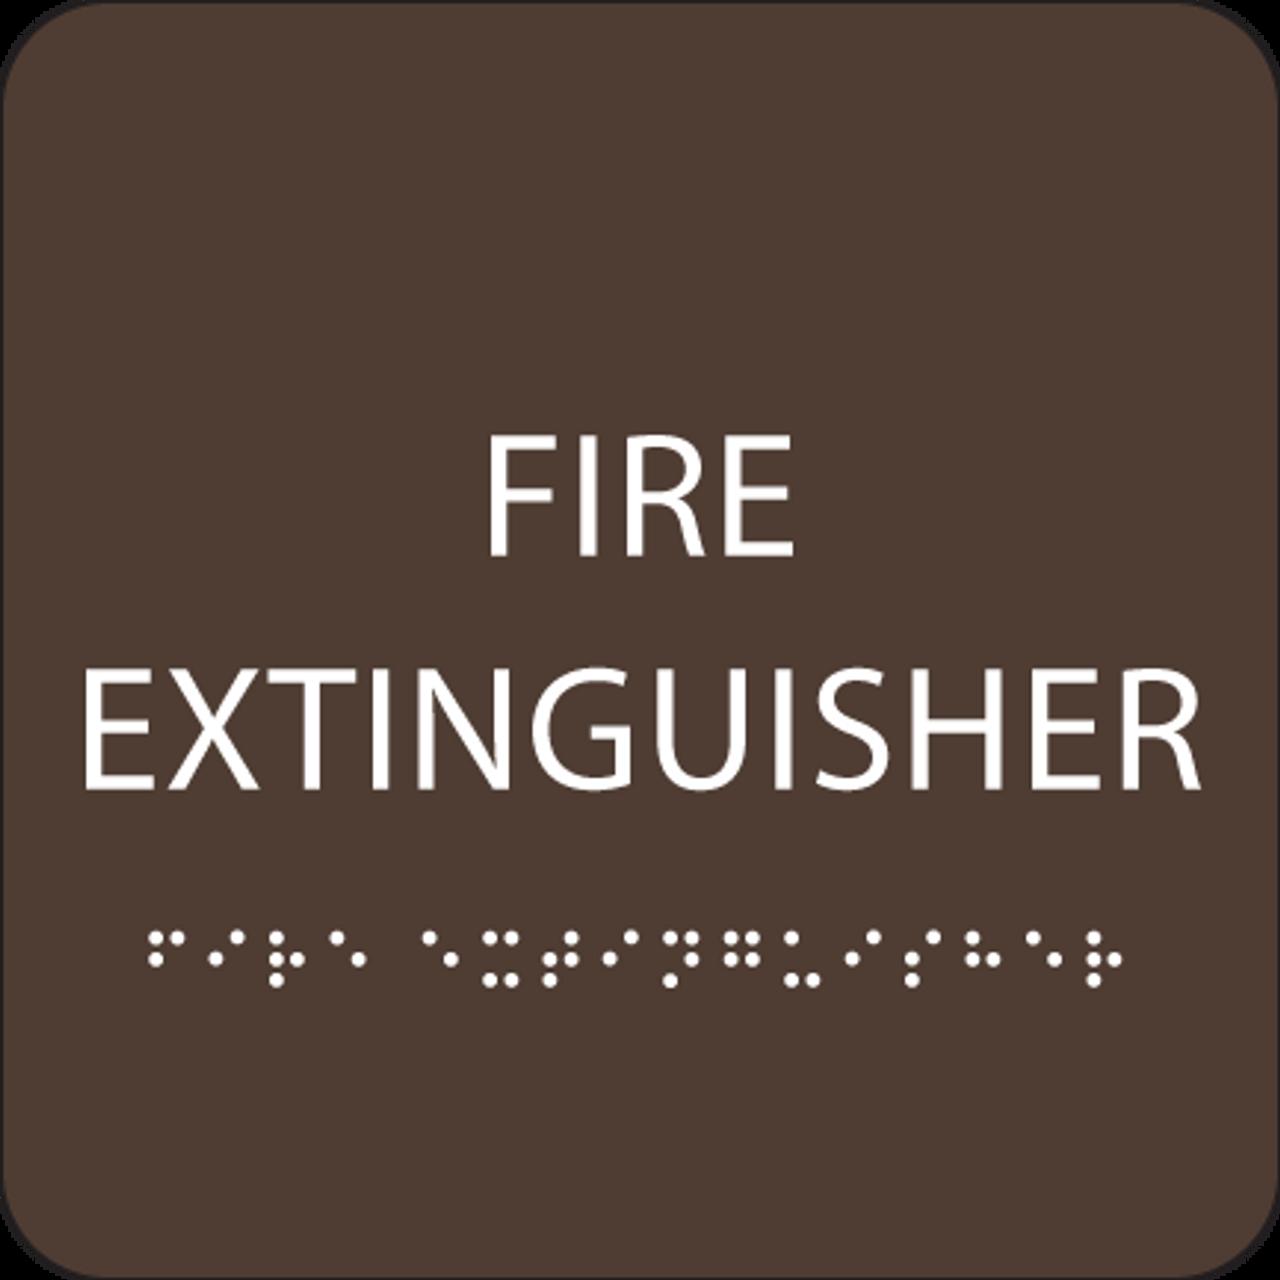 Dark Brown Fire Extinguisher ADA Sign